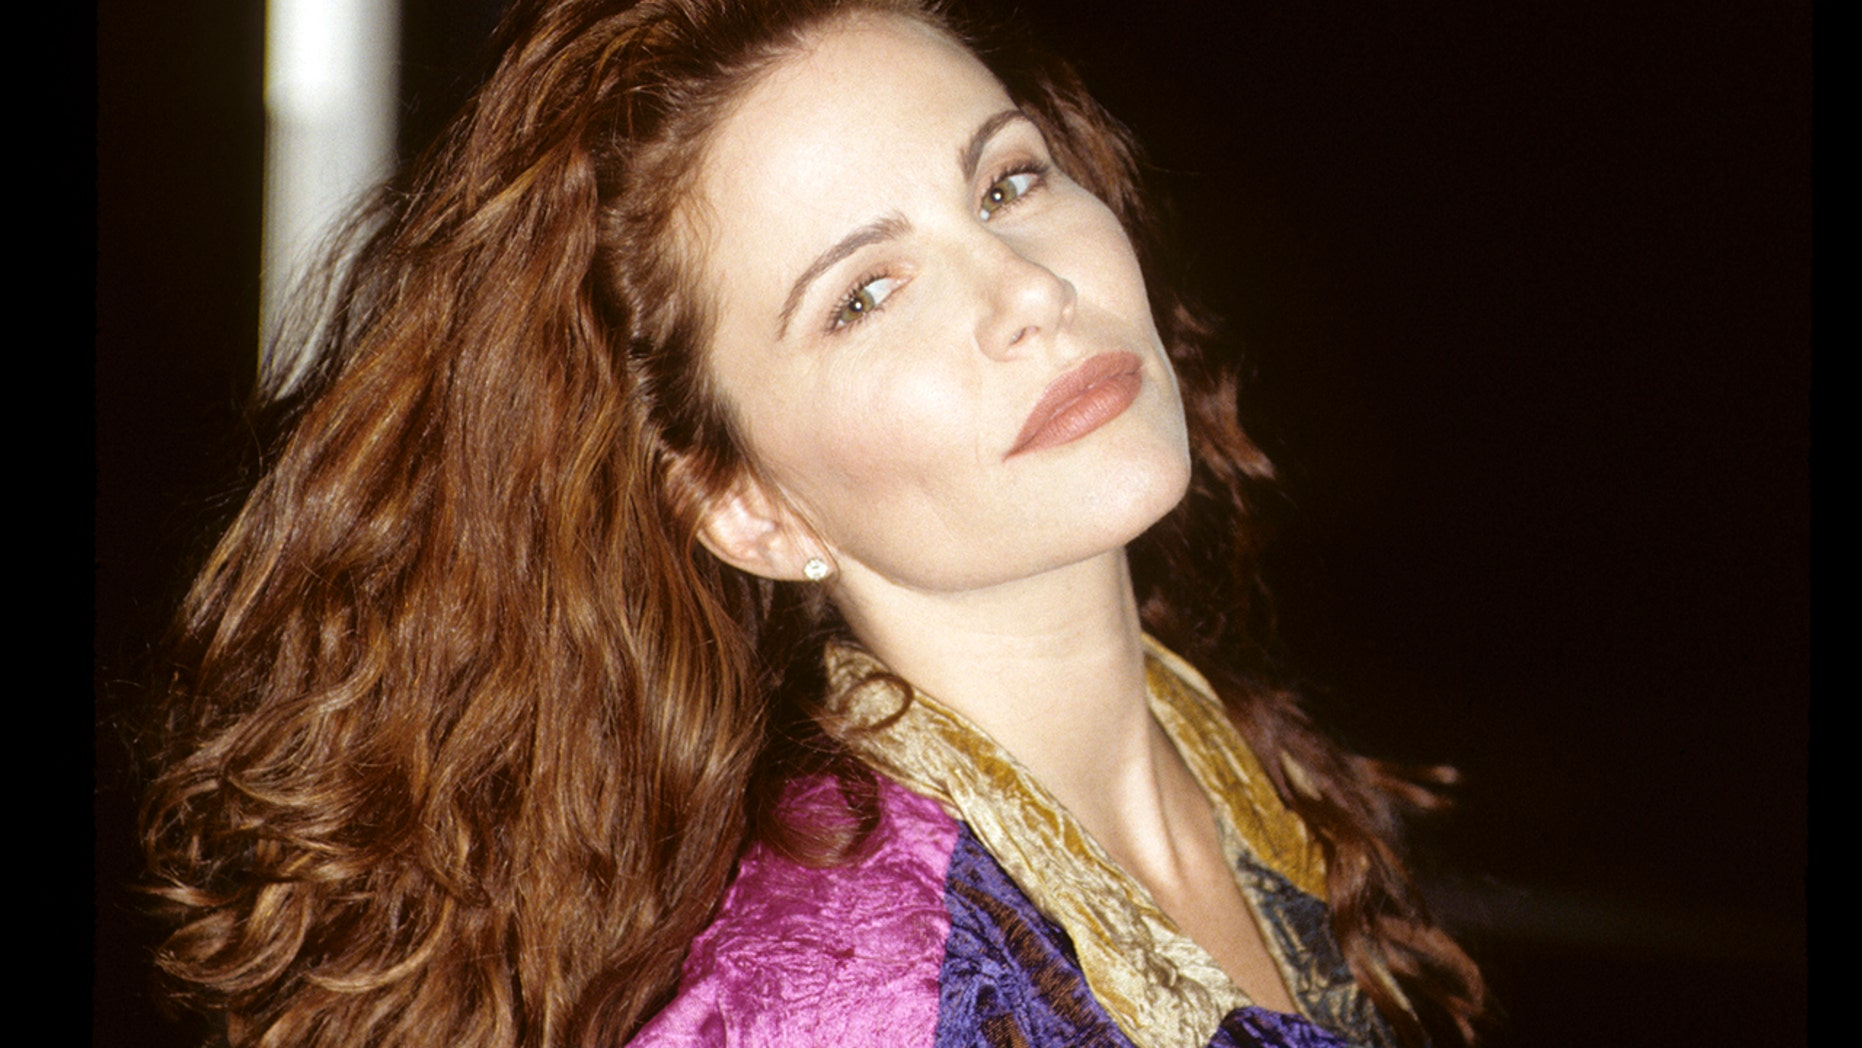 Tawny Kitaen poses for a photo on November 17, 1994.